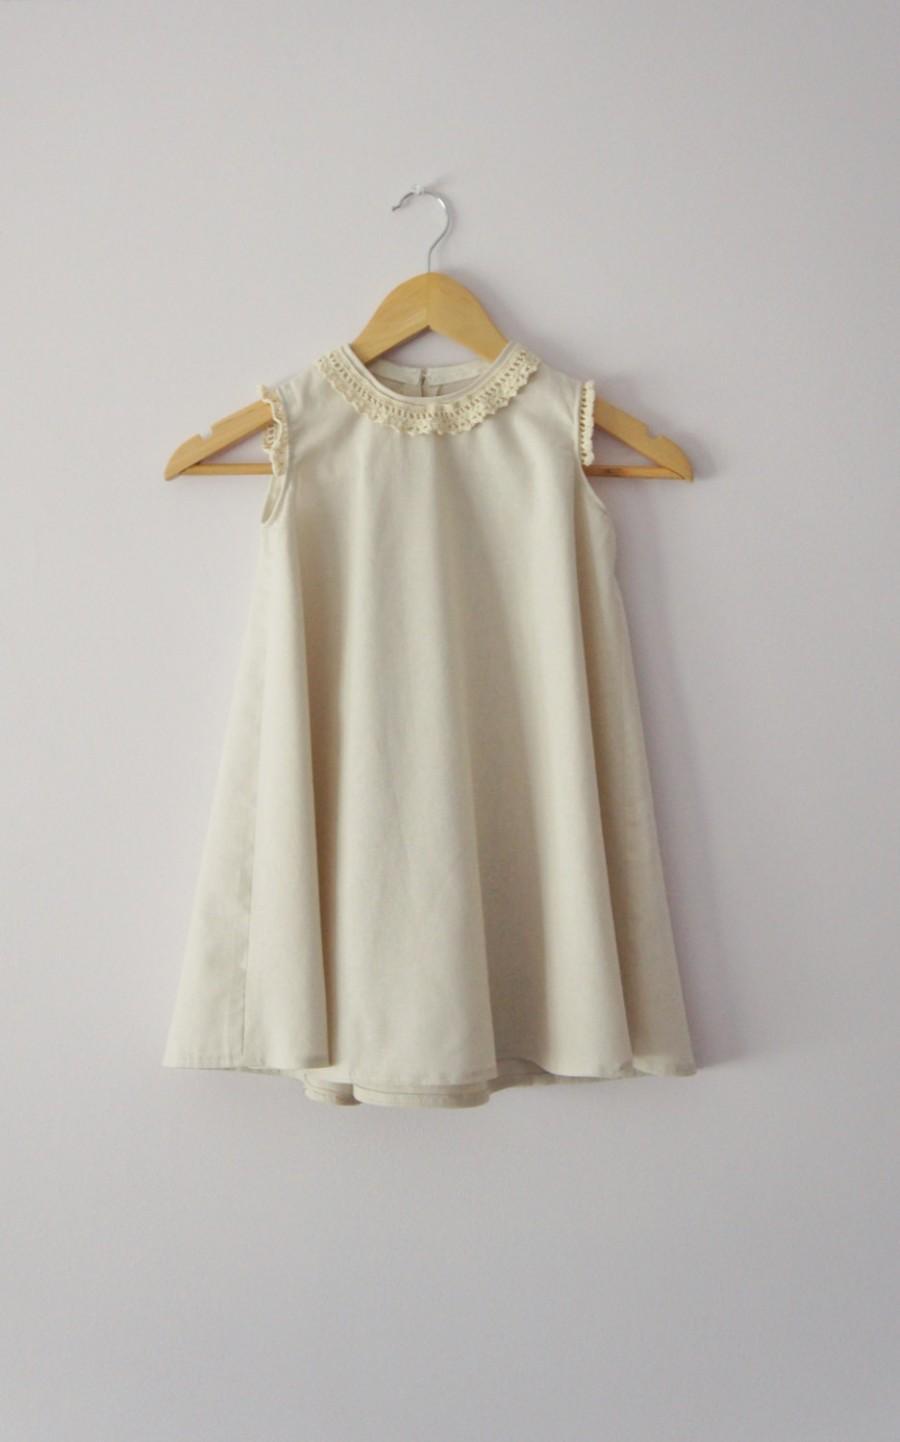 95fdf6dff1d3 Flower Girl Dress, Linen Dress, Ivory Dress, Birthday Dress, Baby Infant Toddler  Dress, Bridesmaid Dress, Sleeveless Dress, Fall wedding